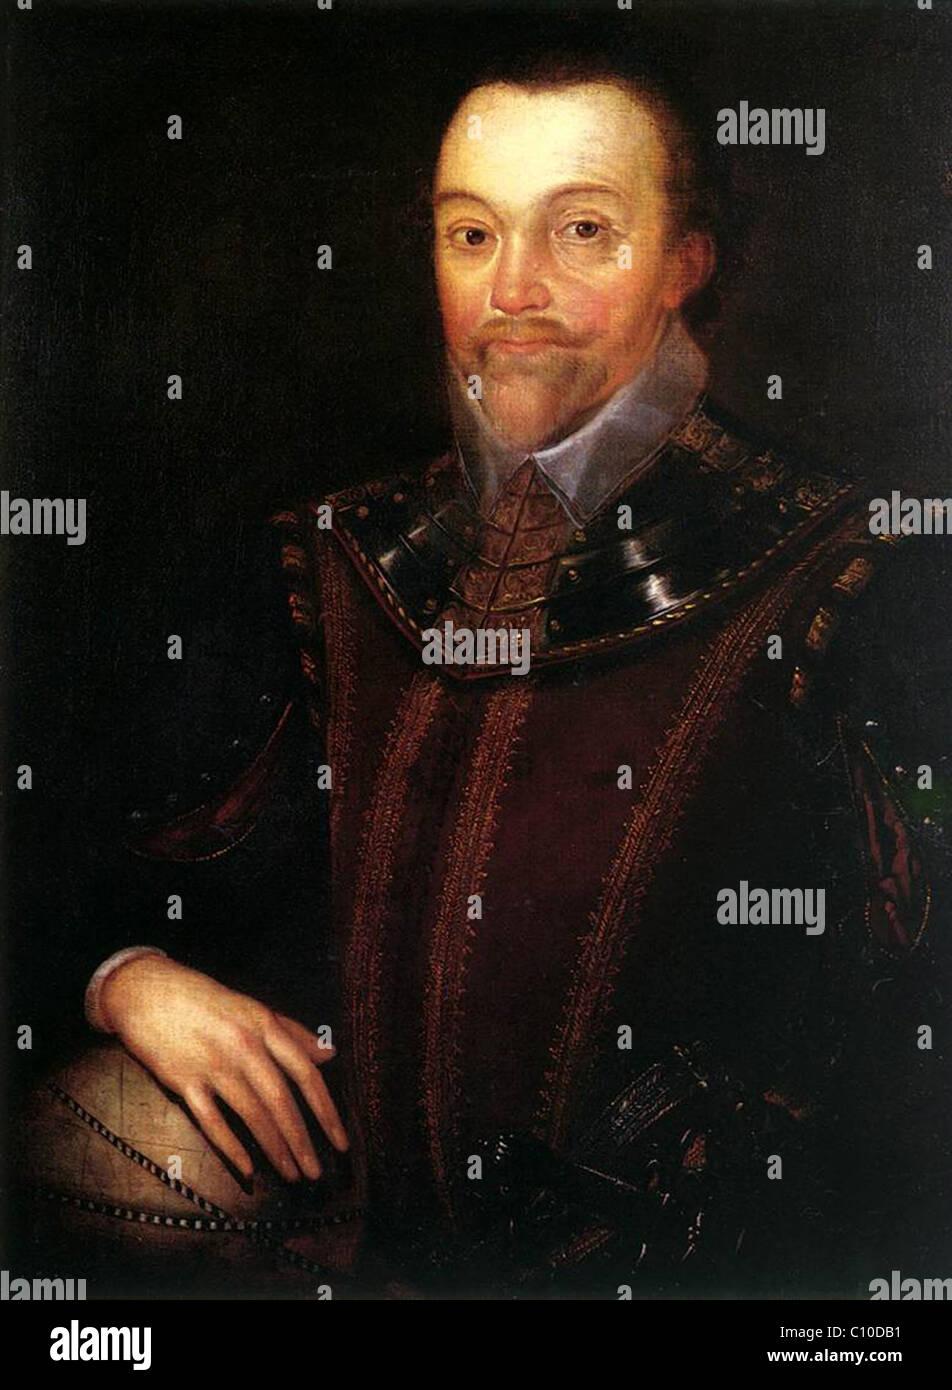 Sir Francis Drake - Stock Image